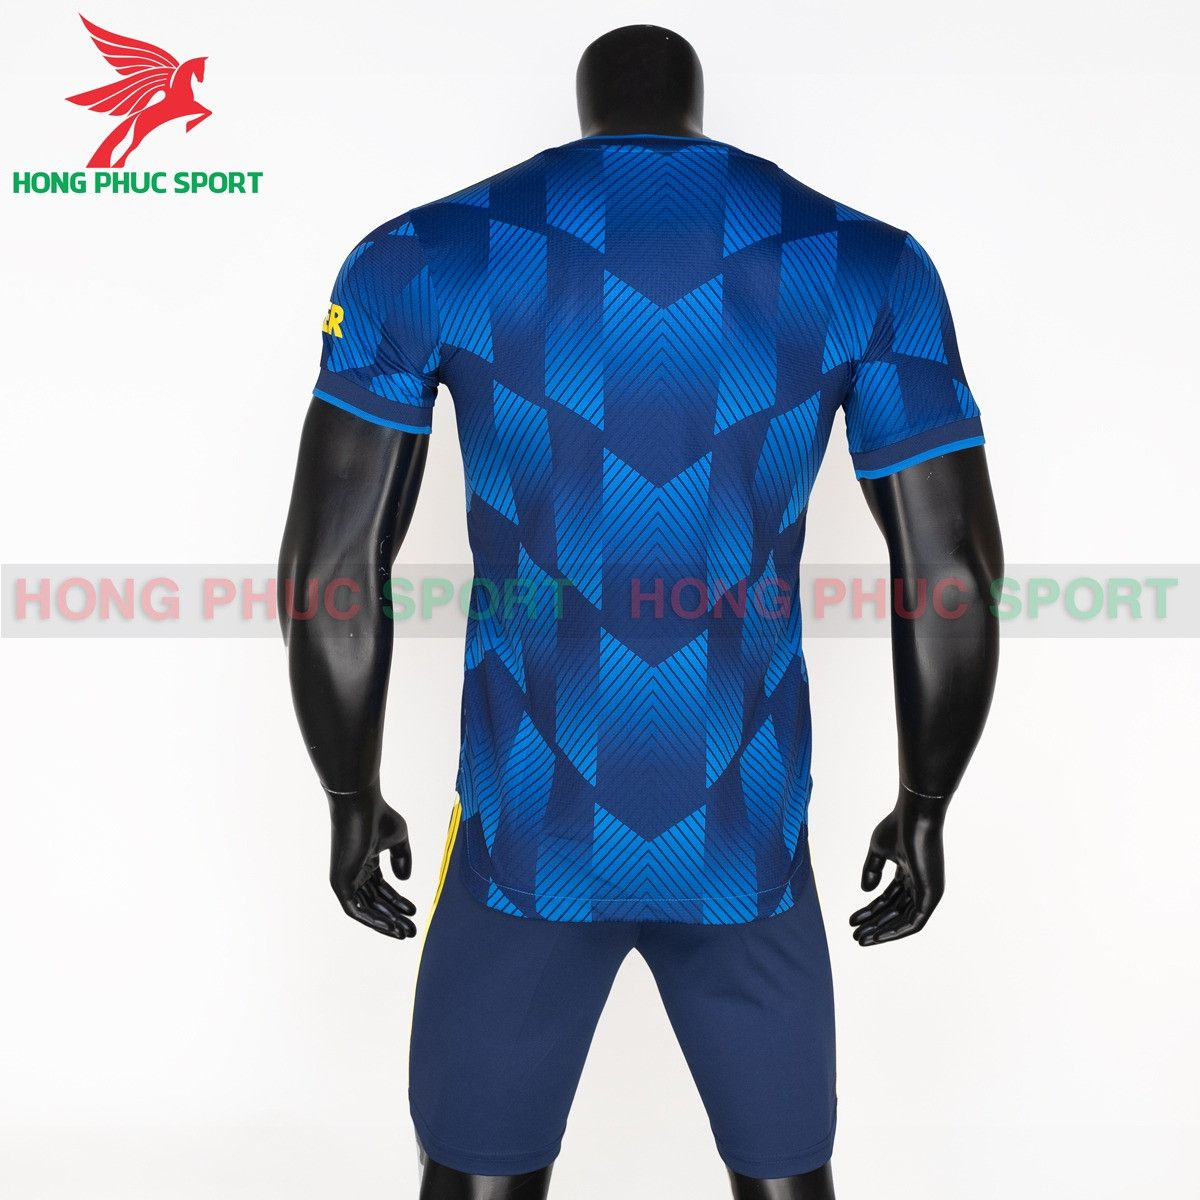 https://cdn.hongphucsport.com/unsafe/s4.shopbay.vn/files/285/ao-dau-manchester-united-2021-2022-mau-thu-3-thailand-7-6149b0dc487ce.jpg